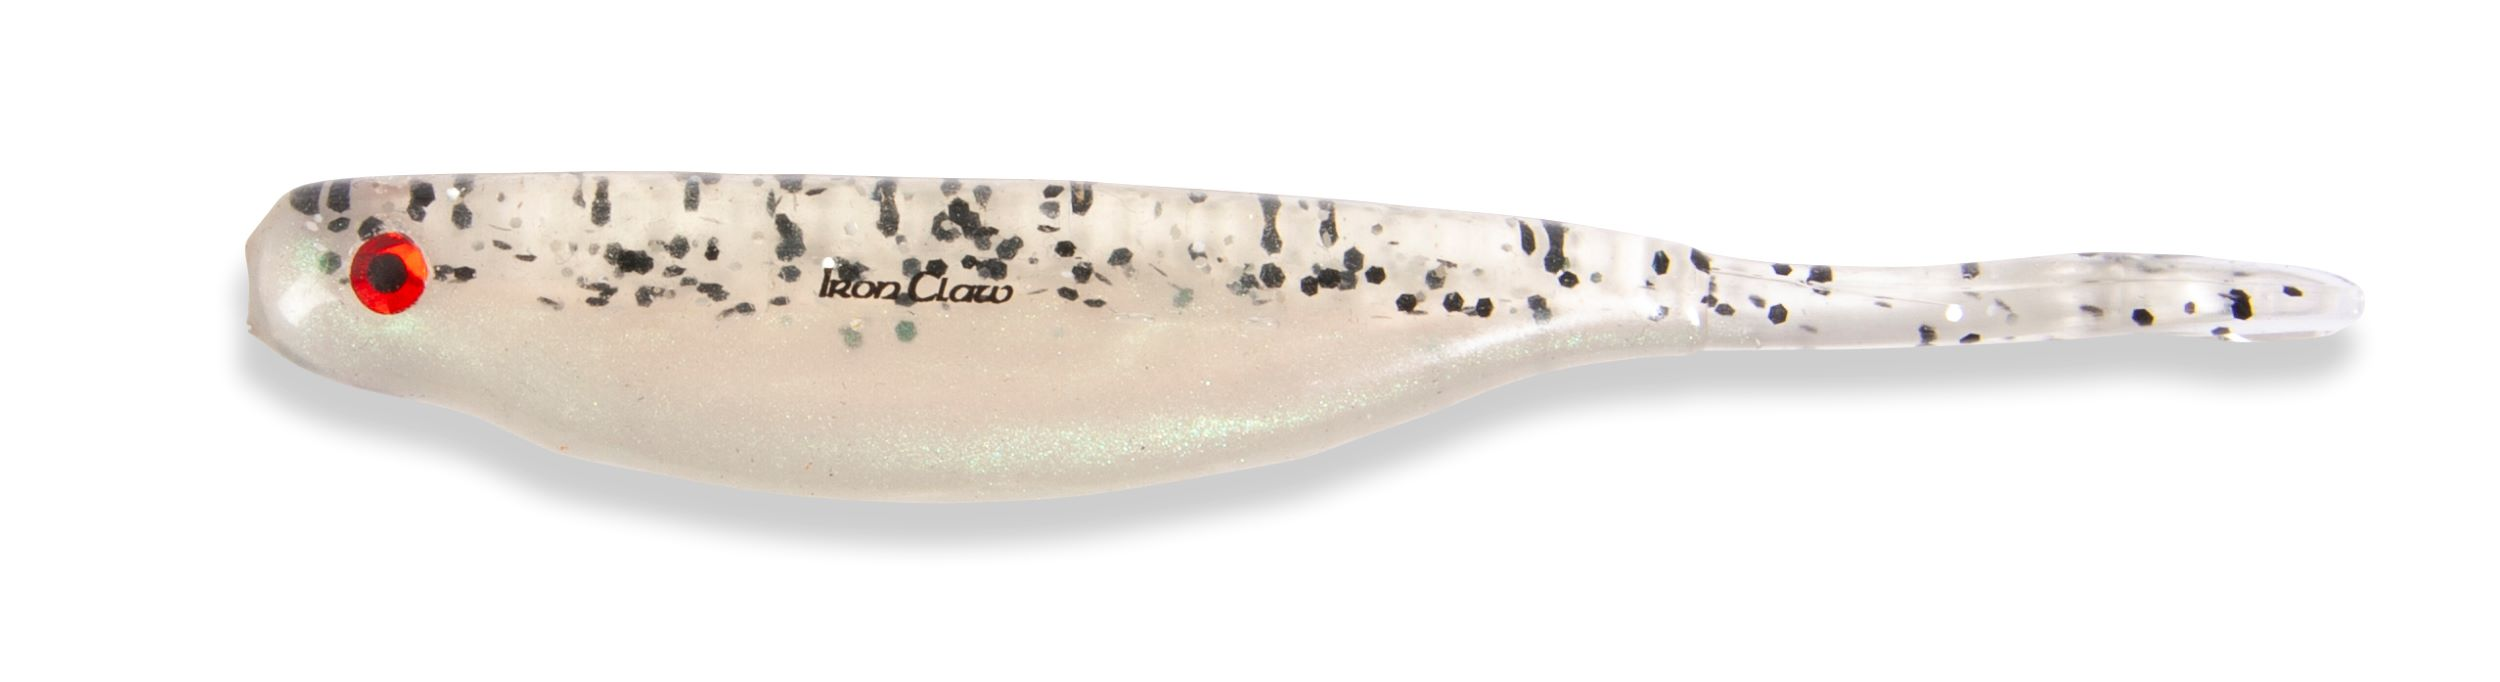 Iron Claw gumová nástraha Premium Split Tail 6,5 cm Vzor SP, 5ks/bal